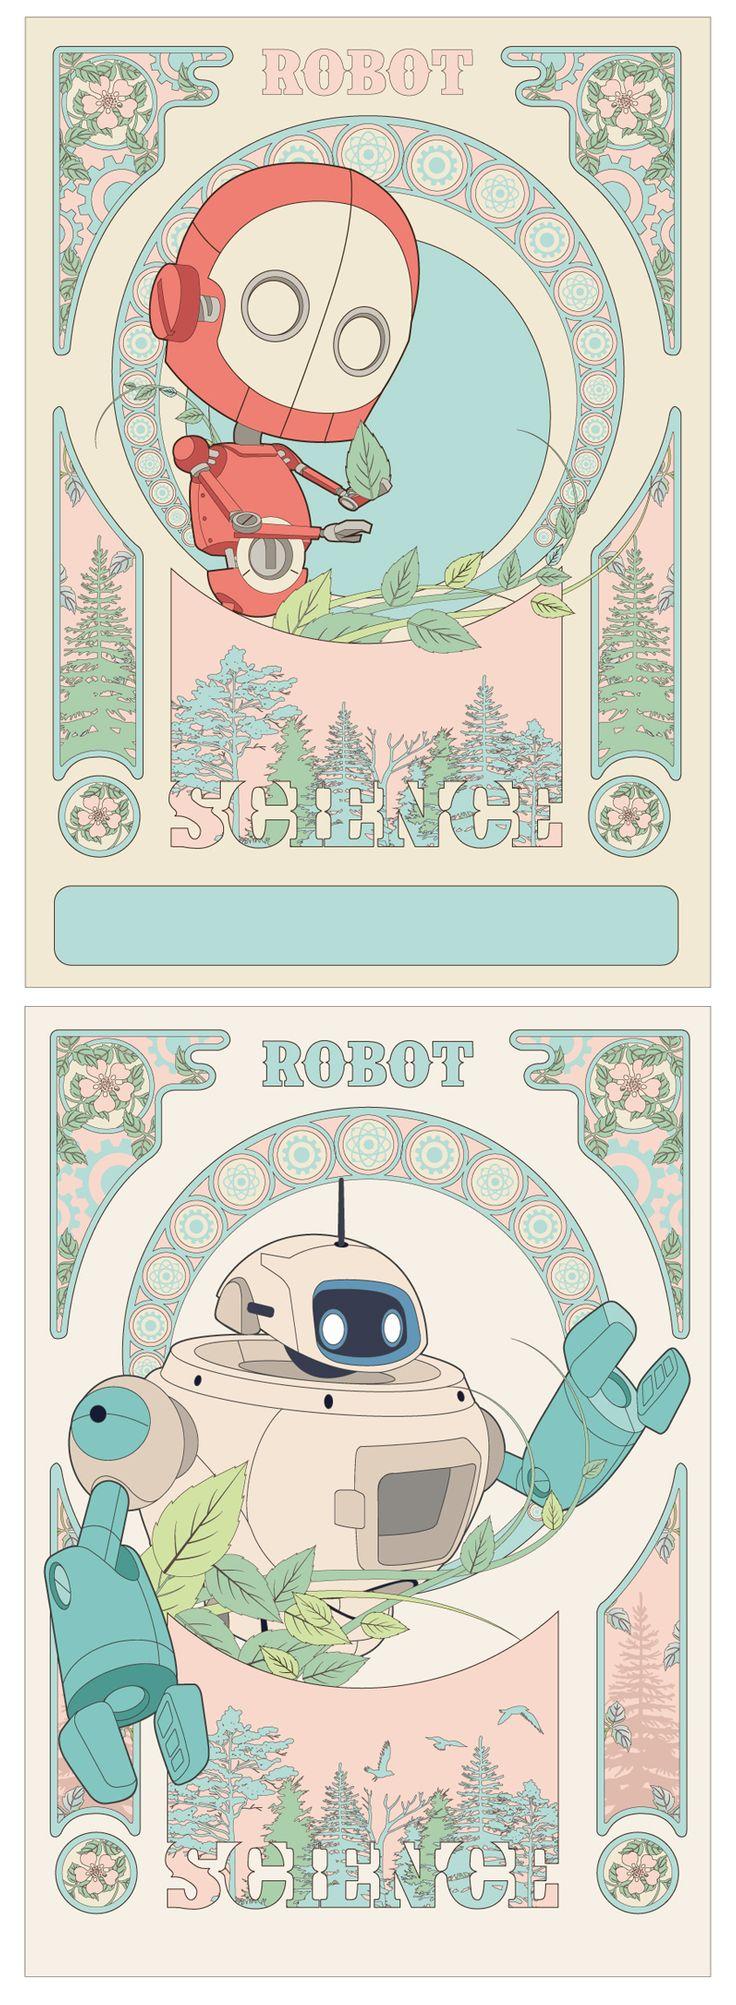 #science #illustration #robot #artnoueau